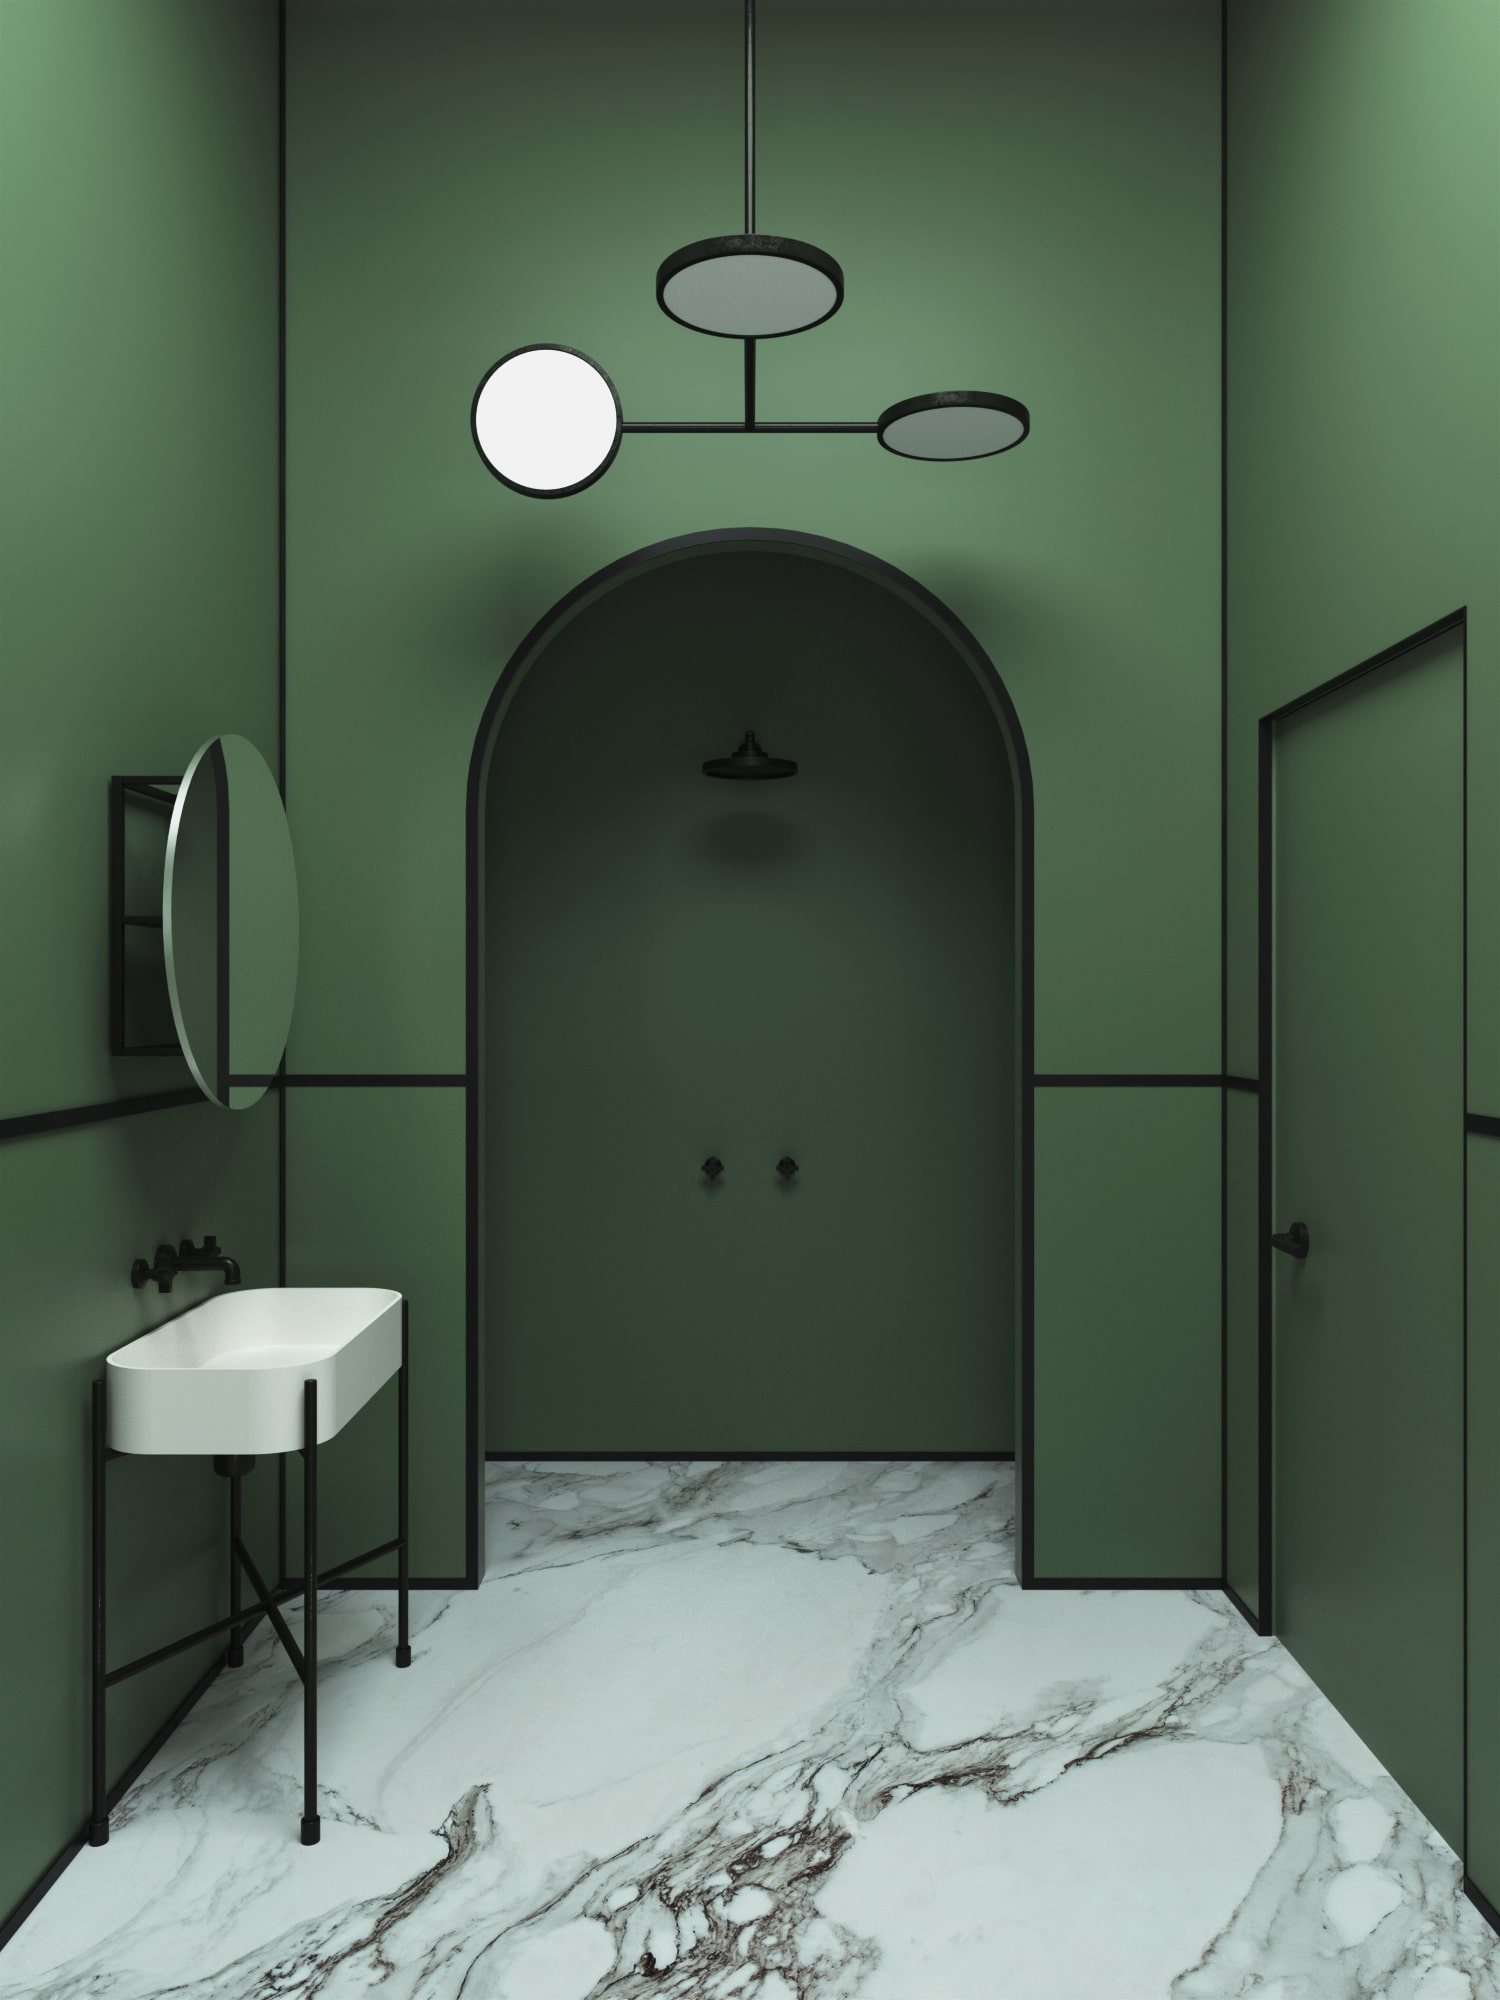 Olive_Bathroom_Linar_A1-min